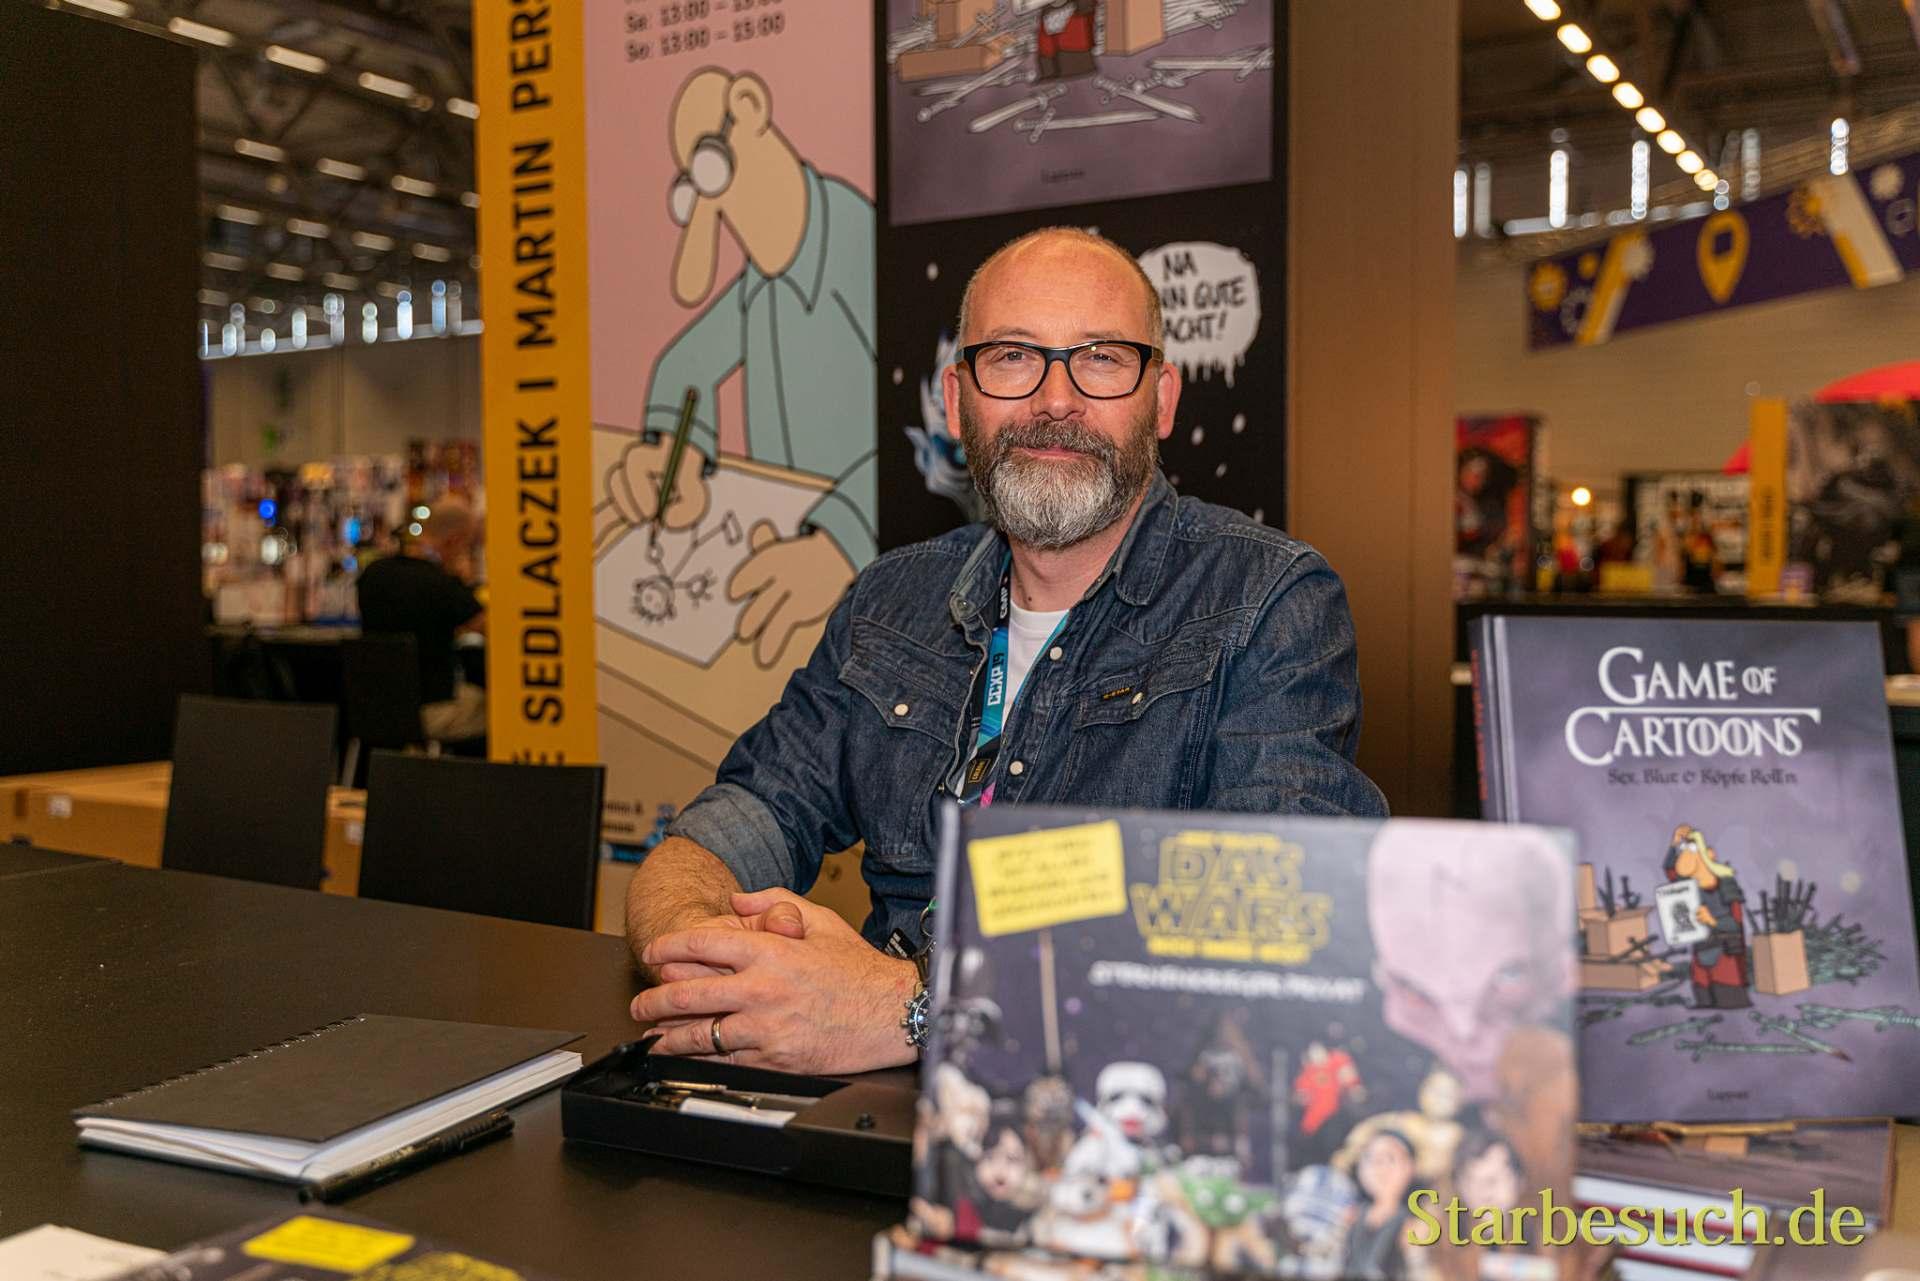 COLOGNE, GERMANY - JUN 28th 2019: André Sedlaczek at CCXP Cologne